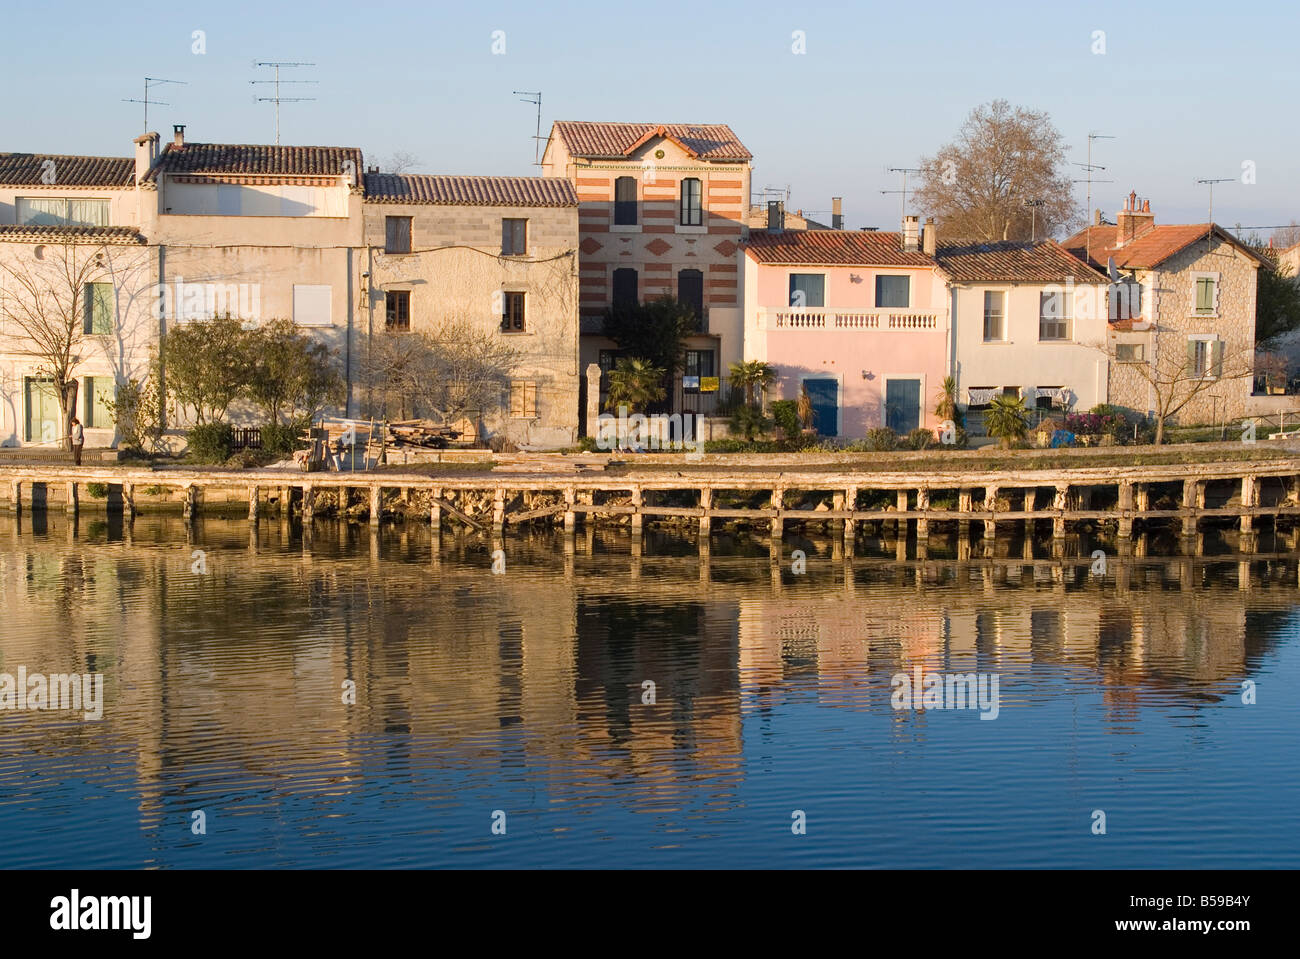 Riverside, Aigues-Mortes, Languedoc, France, Europe - Stock Image